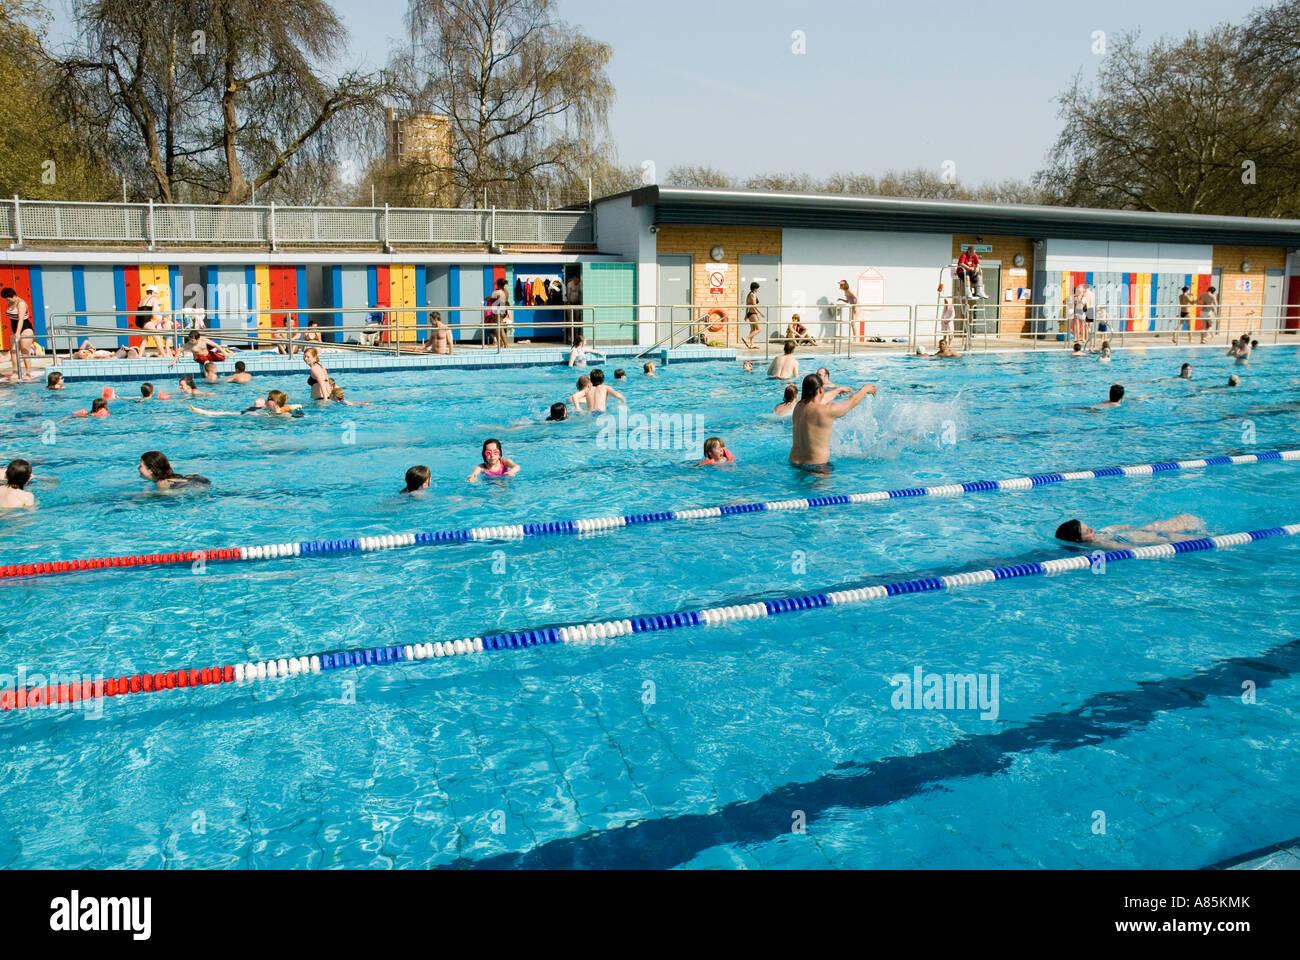 People enjoying sunny afternoon London Fields LIDO London Borough of Hackney outdoor swimming pool Stock Photo